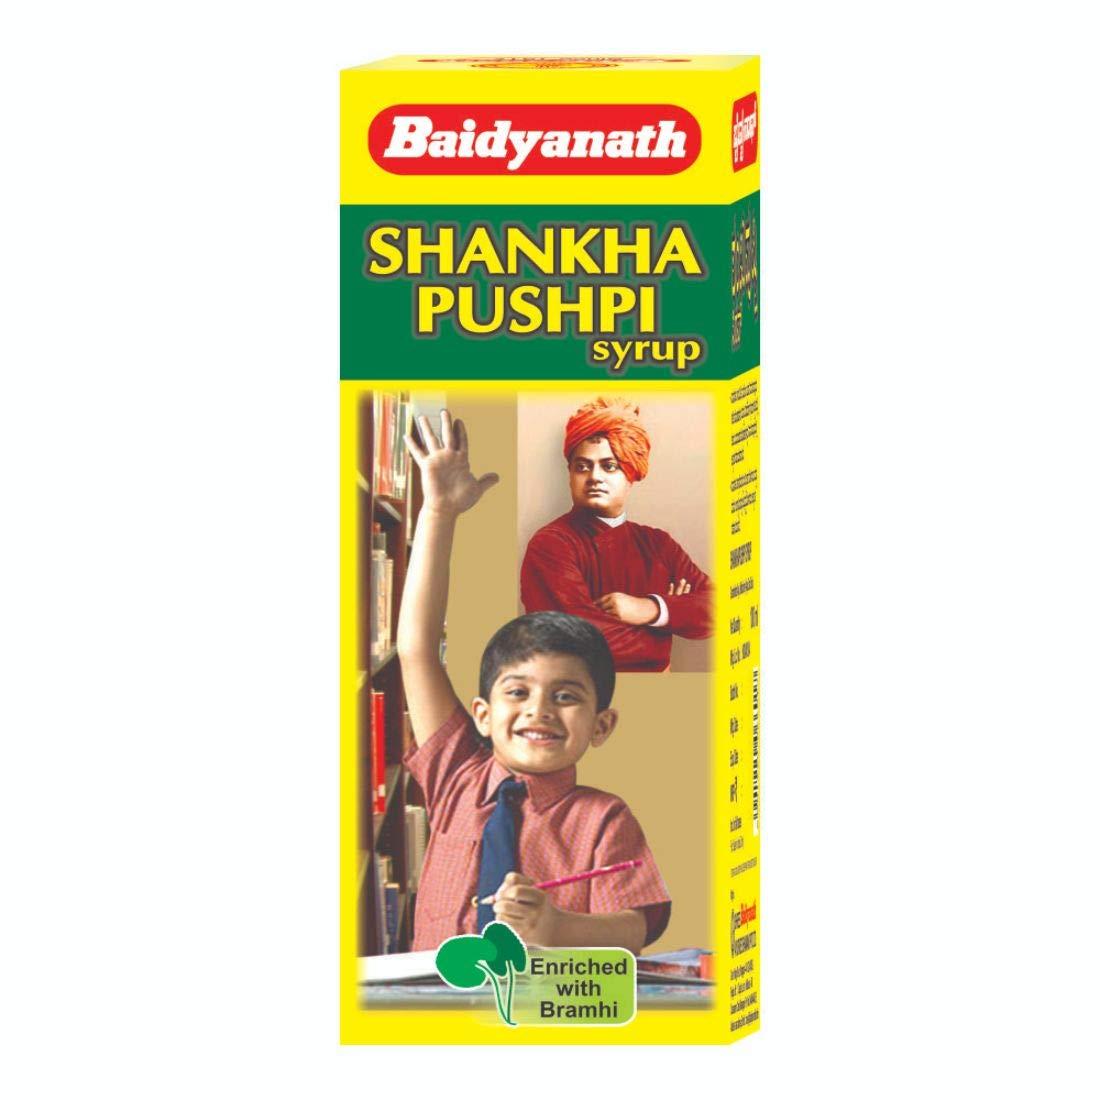 Baidyanath Shankhapushpi Syrup I Concentration Supplement I Mental Health Supplement I 450 ml